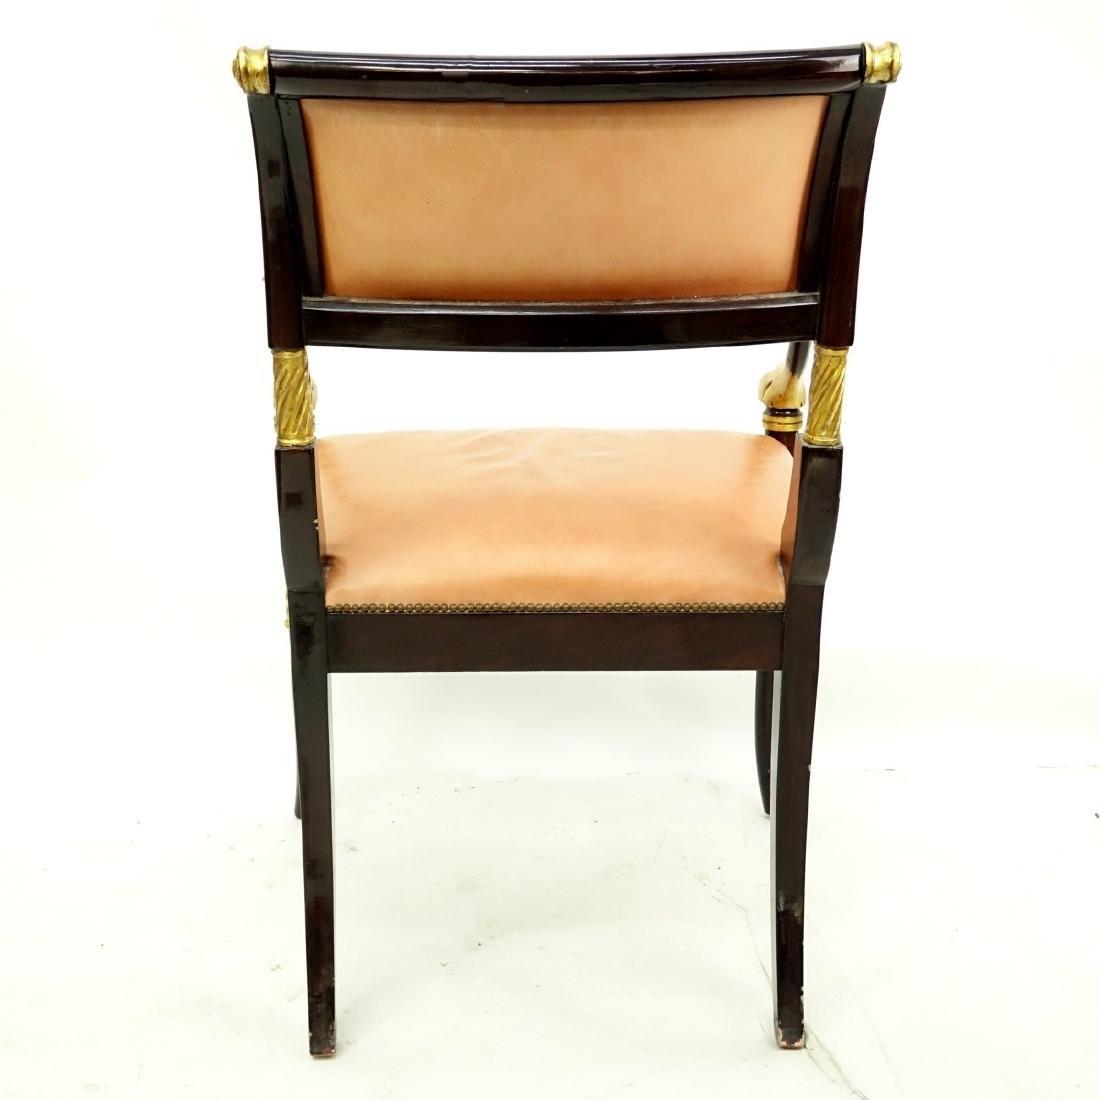 Regency style Arm Chair - 4